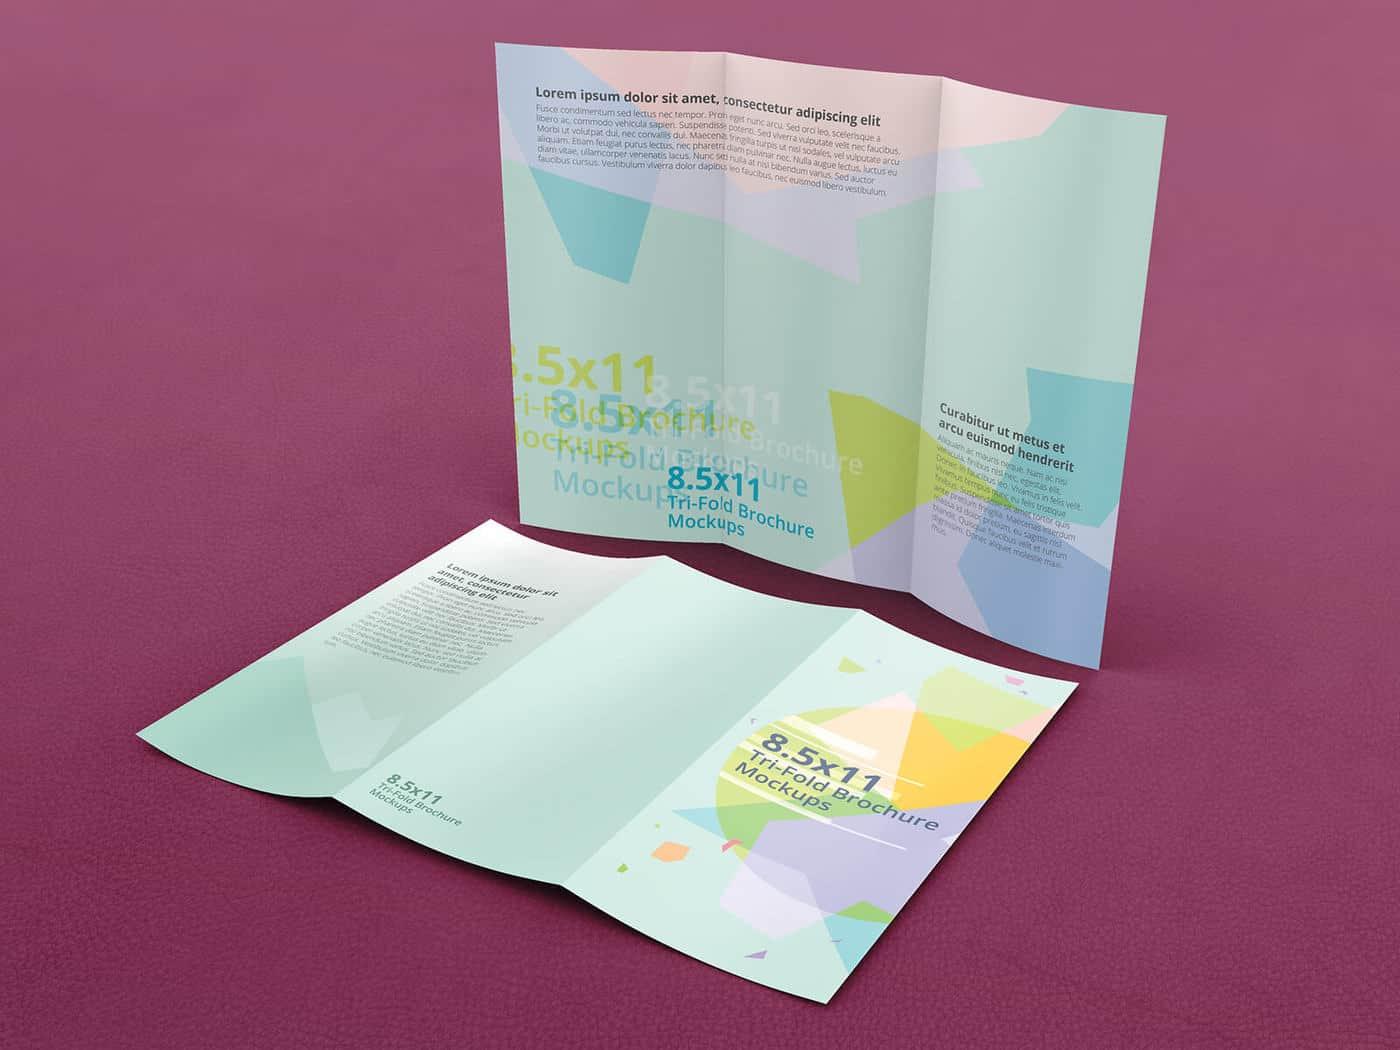 Trifold Brochure Mockups 8 5x11 size on Vectogravic Design